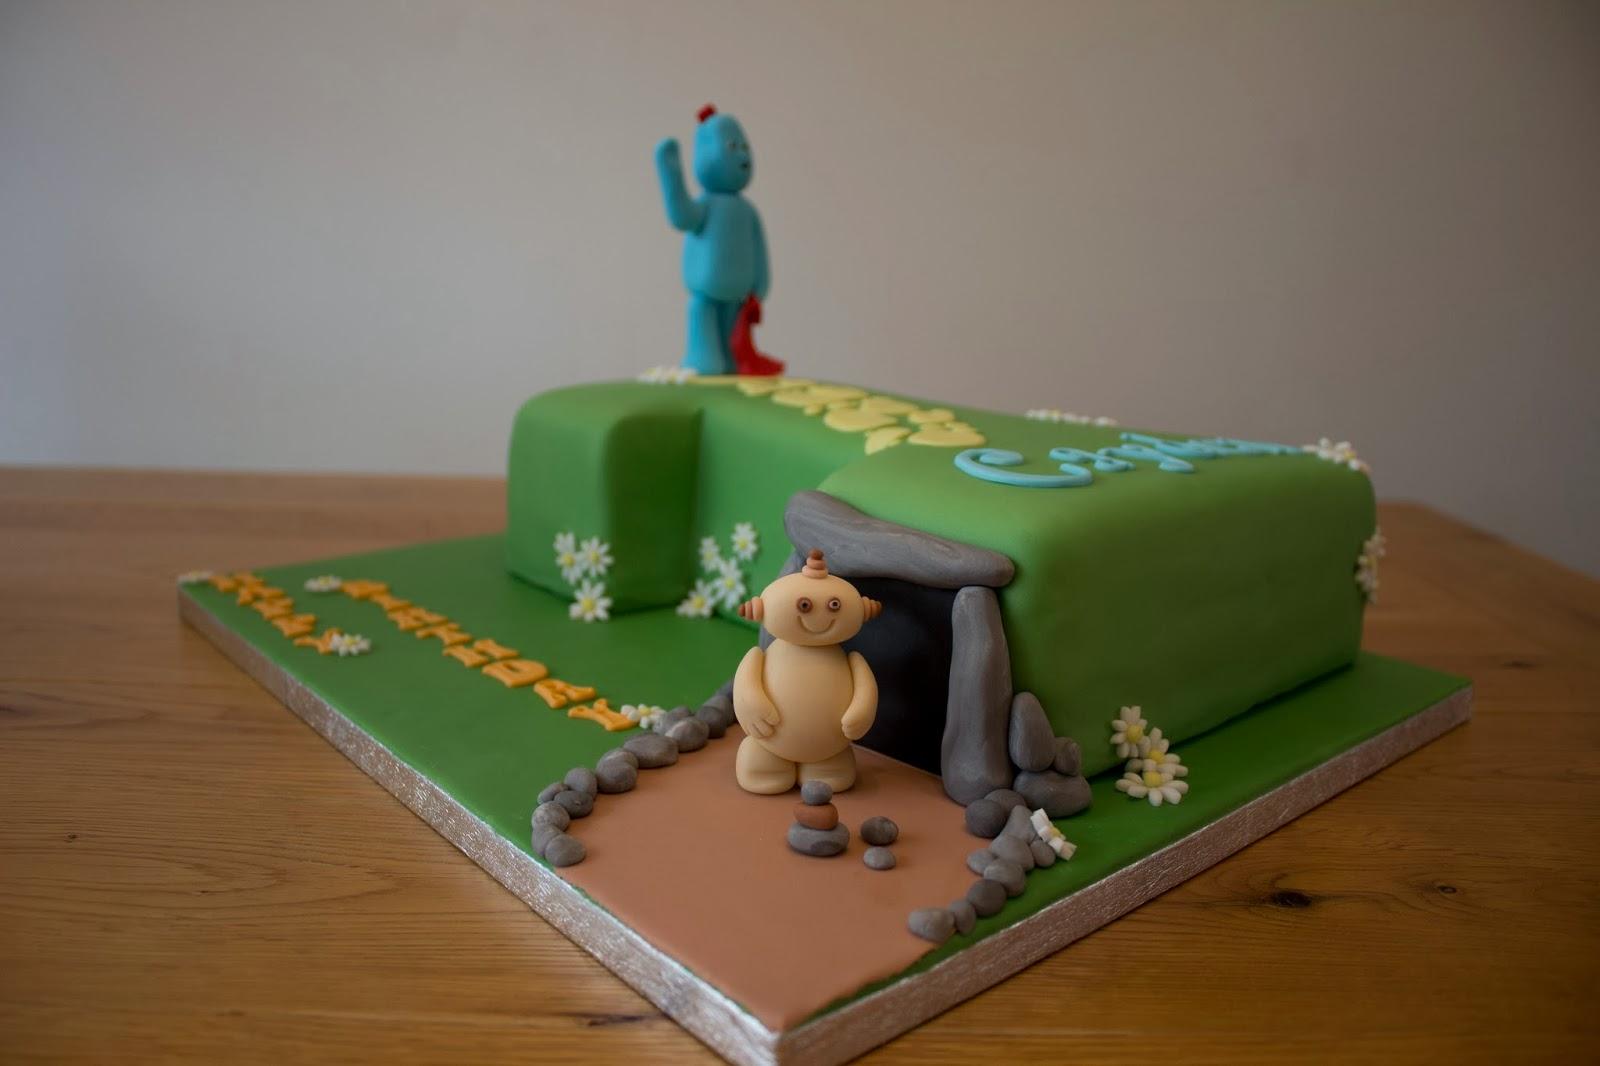 Iggle Piggle First Birthday Cake | The Cake Escape